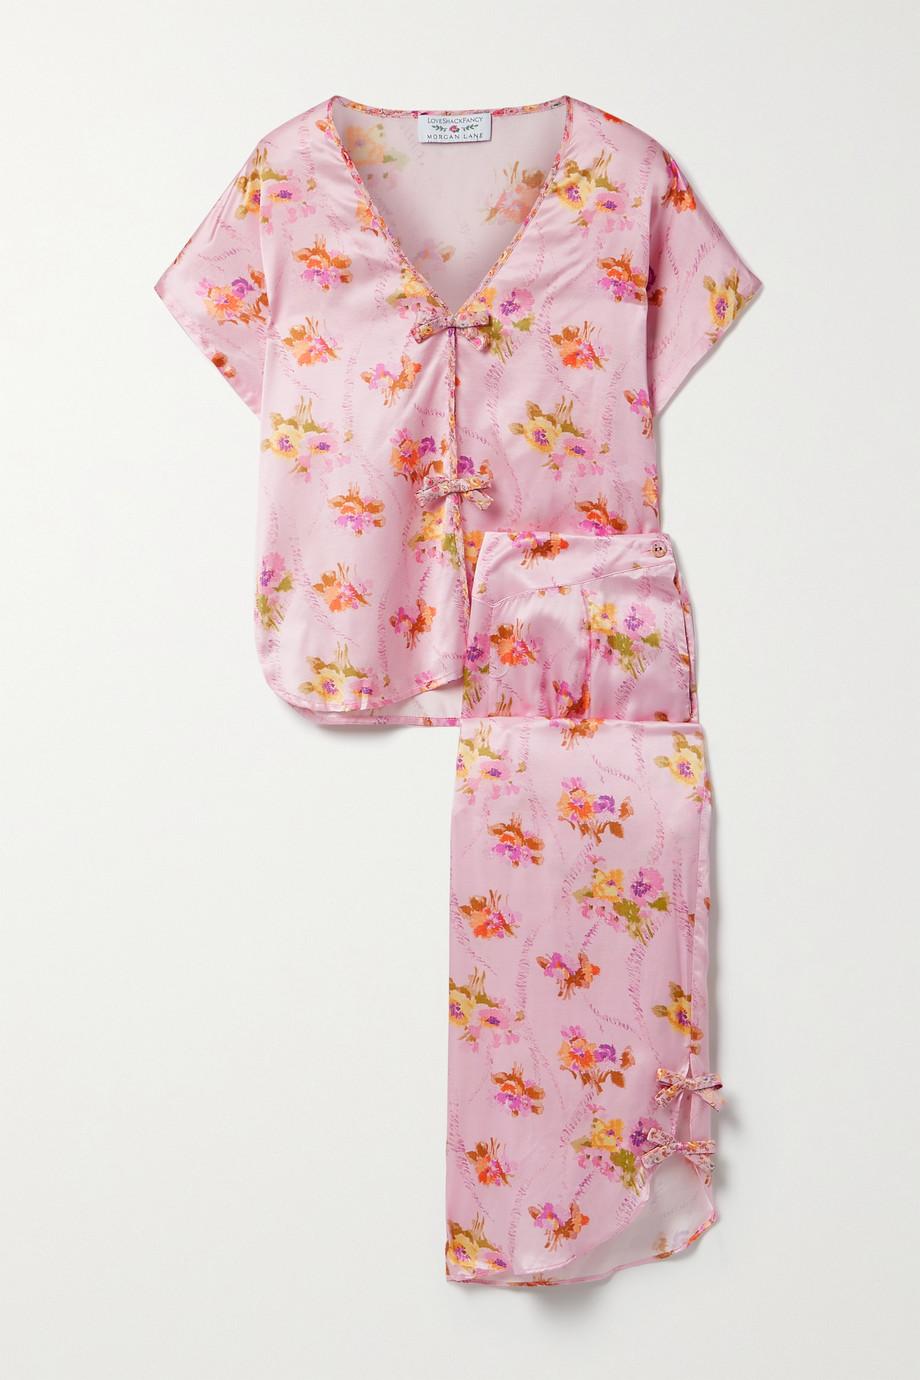 Morgan Lane + LoveShackFancy Joanie Margo floral-print satin pajama set